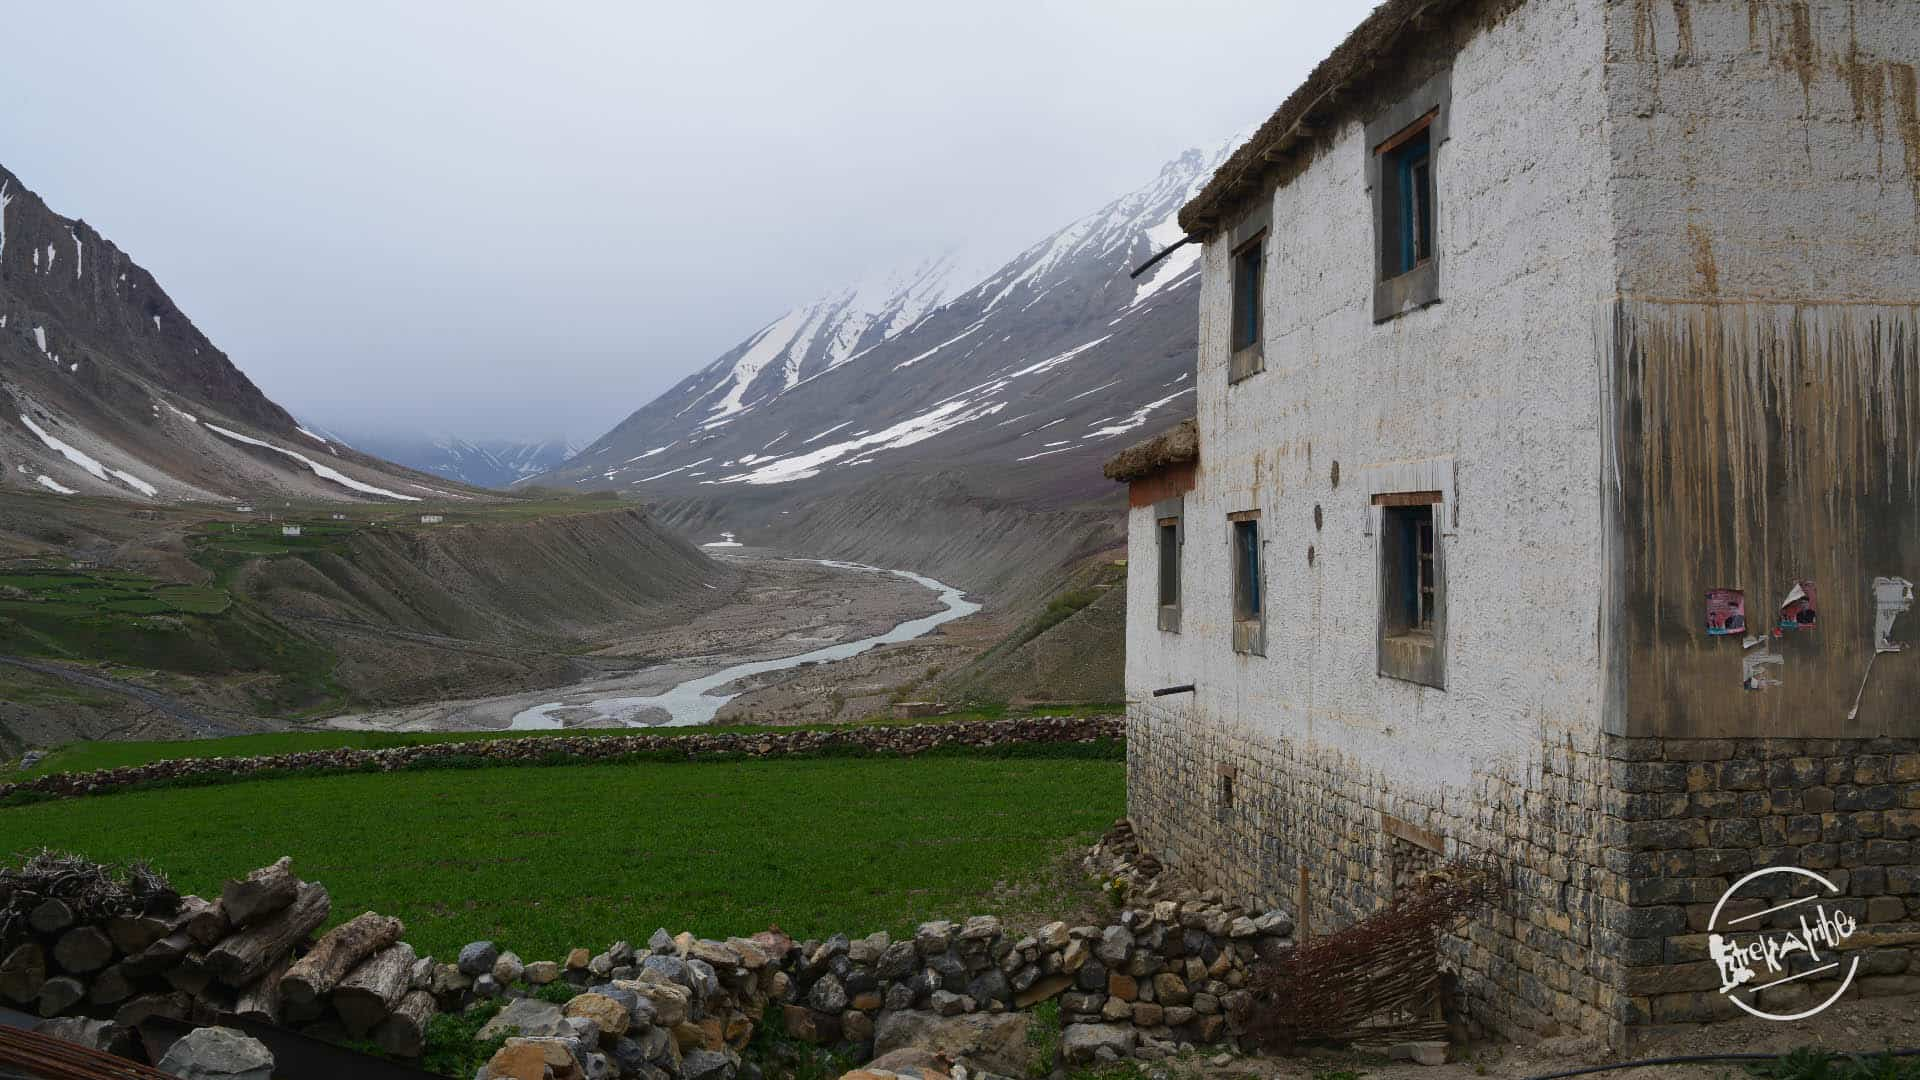 Mudh village